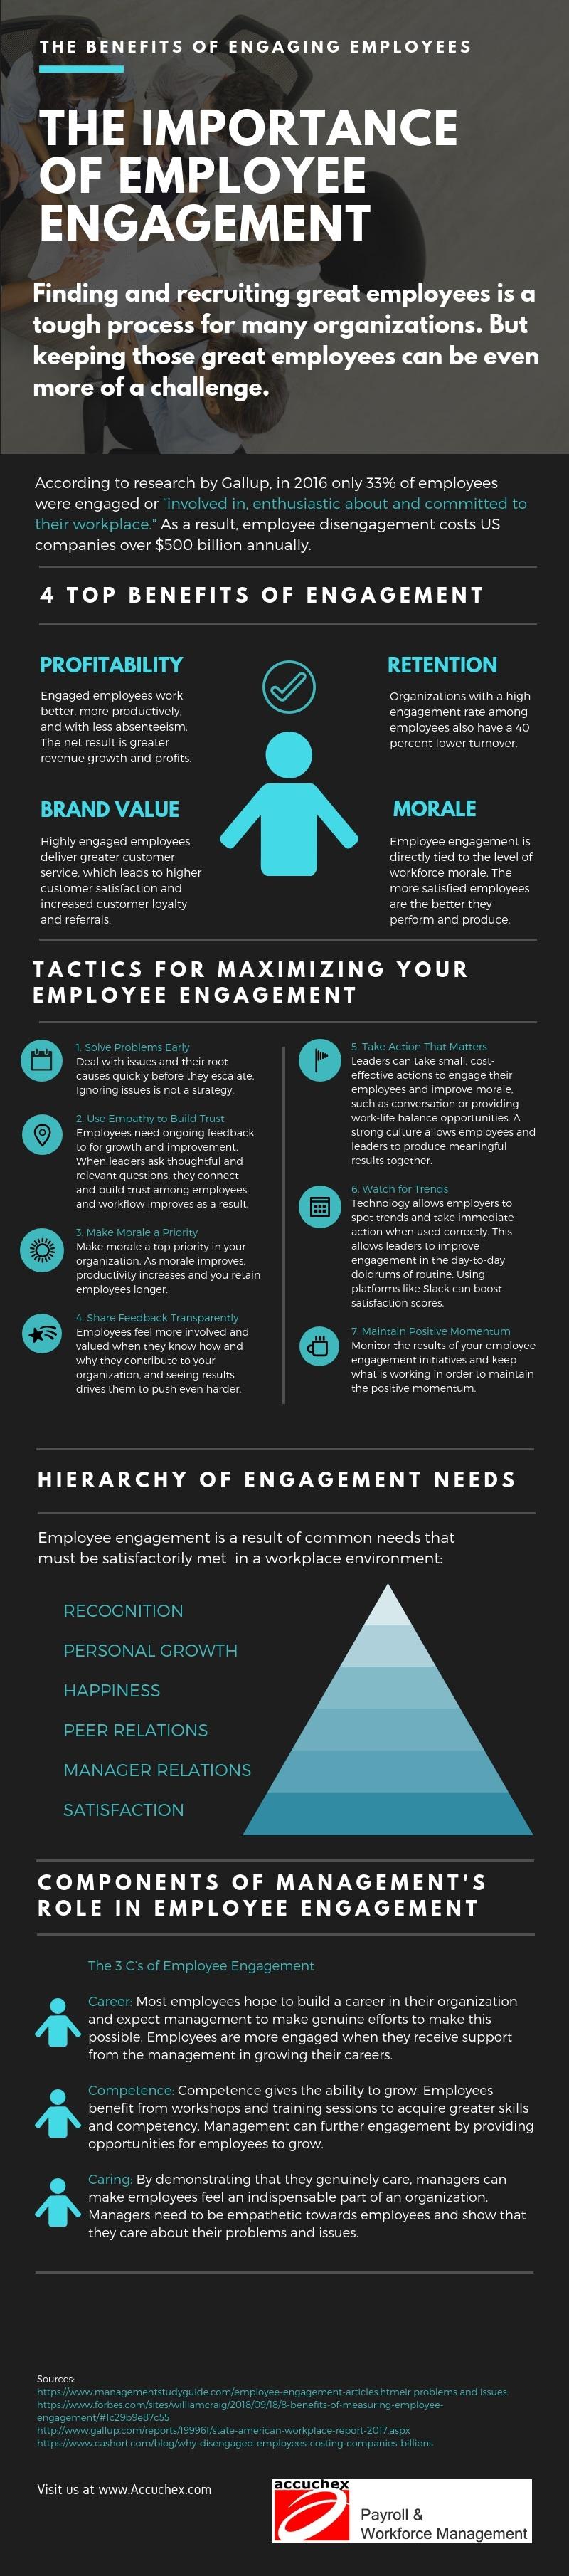 employee-engagement-infographic